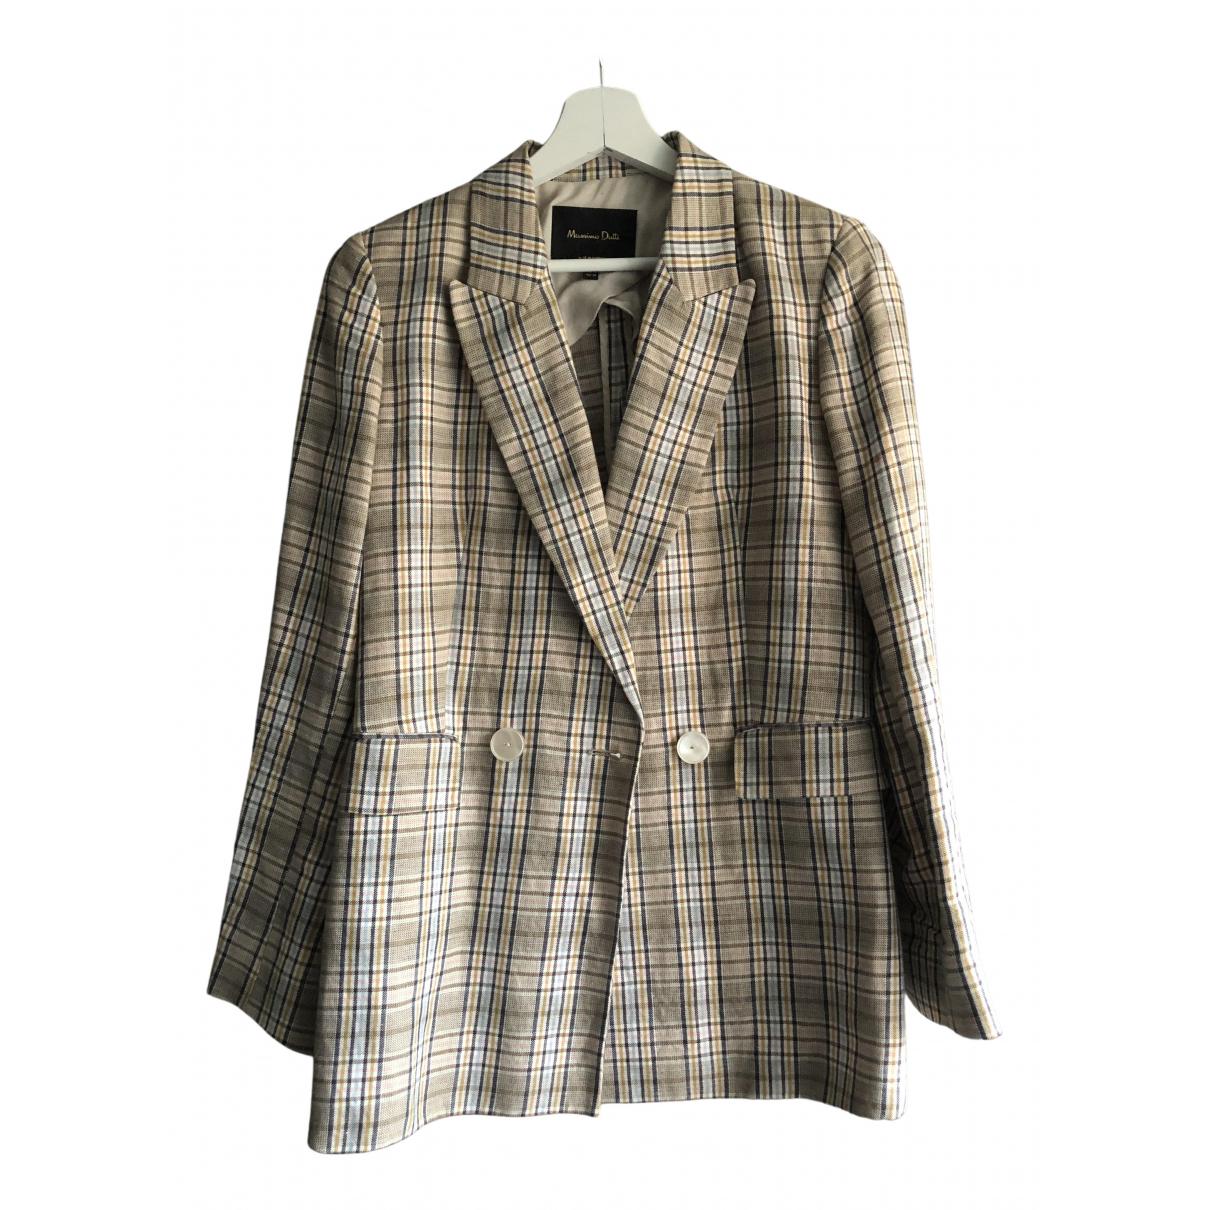 Massimo Dutti \N Beige Cotton jacket for Women 36 FR